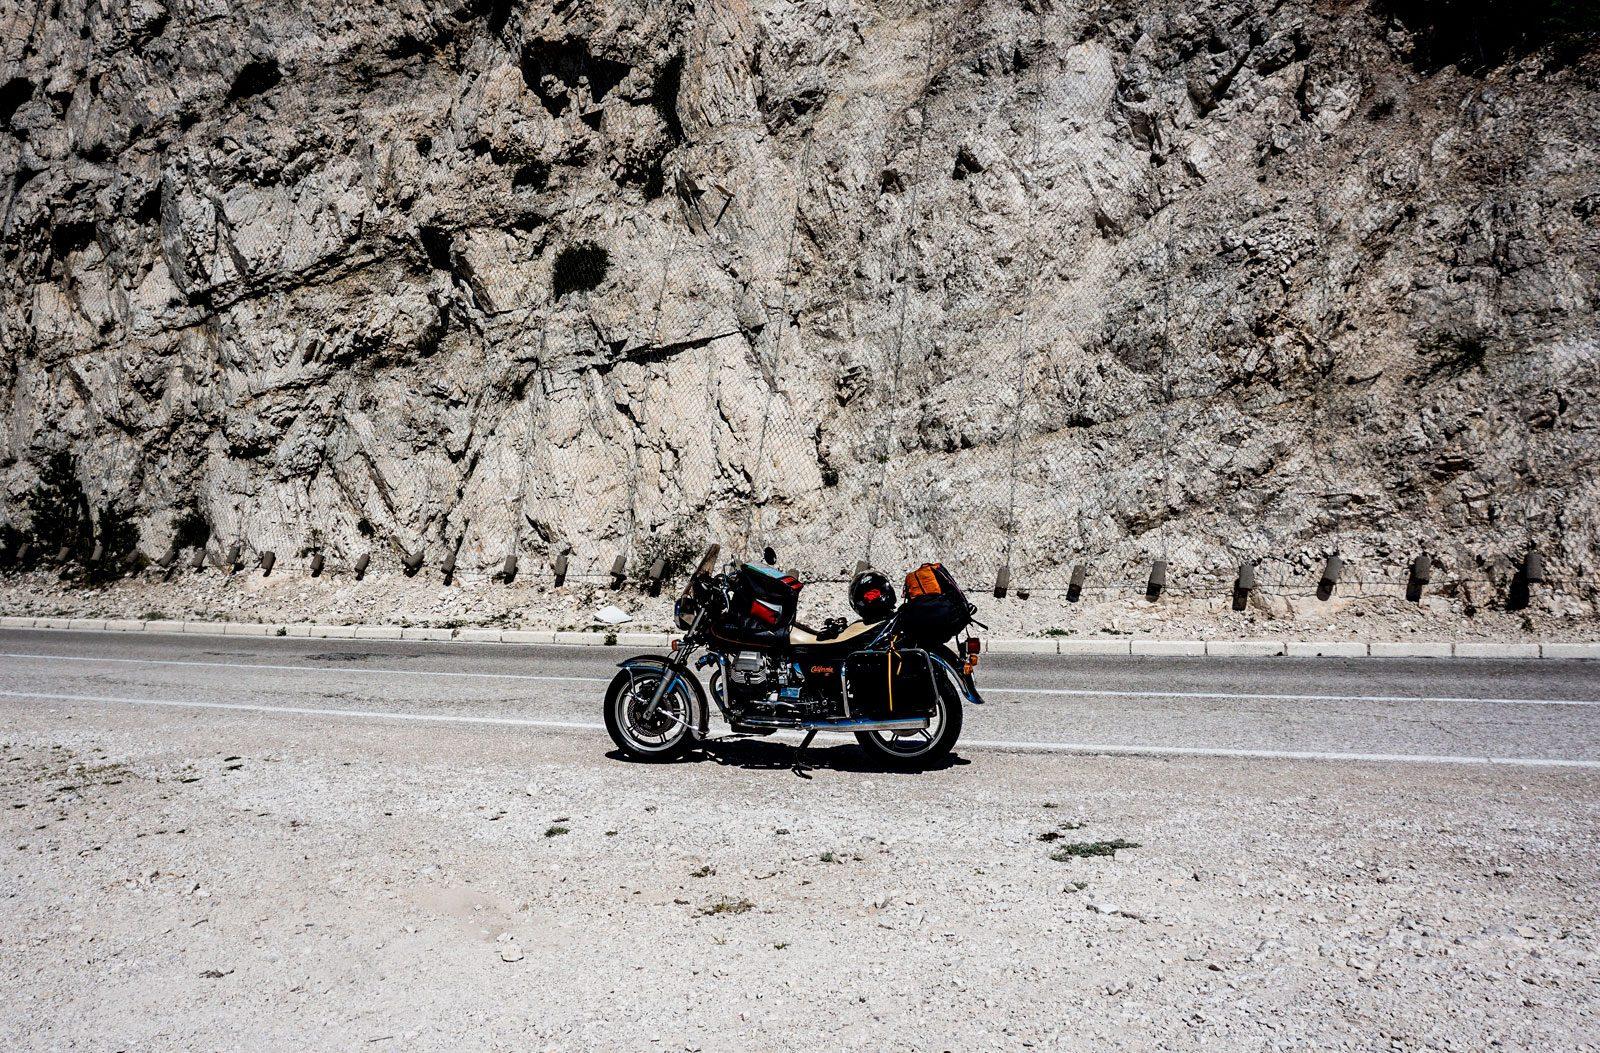 alberto sala writer pictures motorcycles moto guzzi california on the road